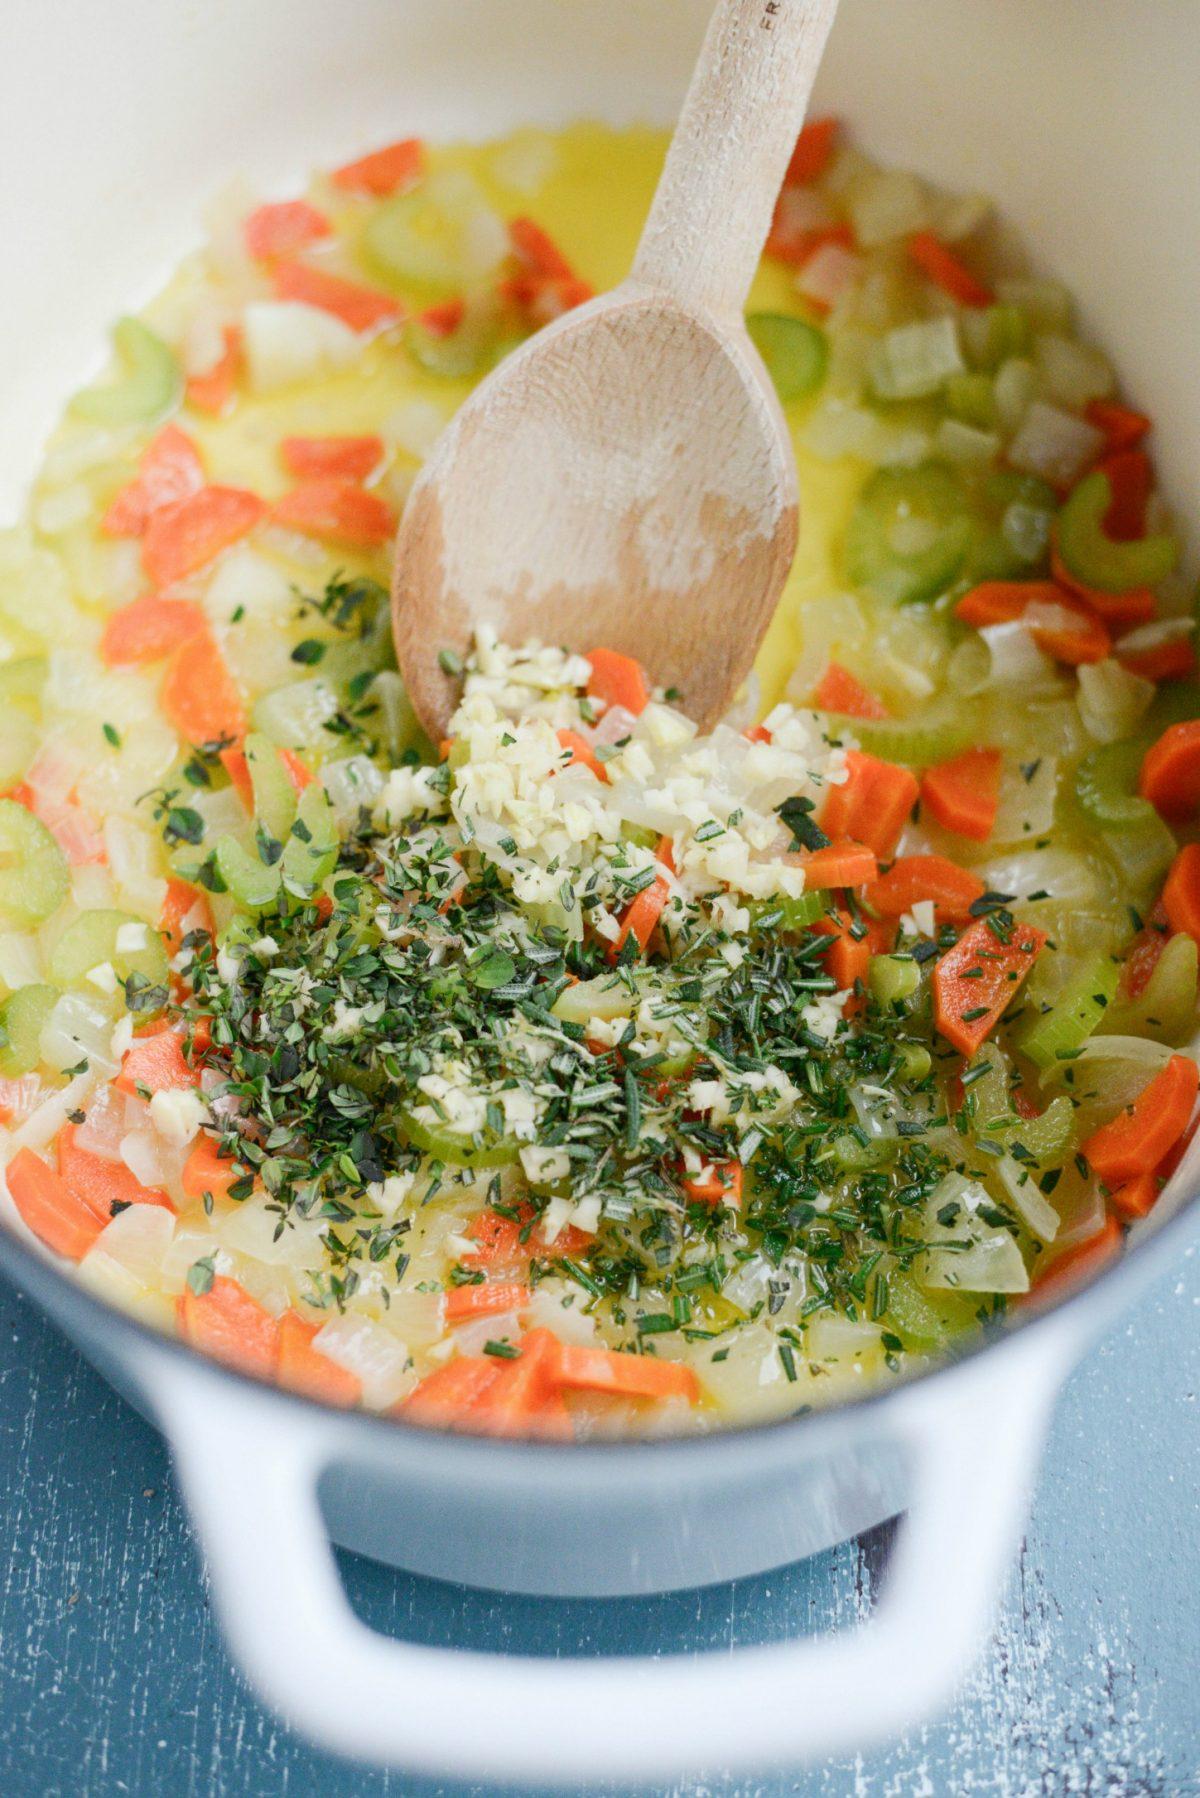 garlic and herbs added to sautéed veggies.